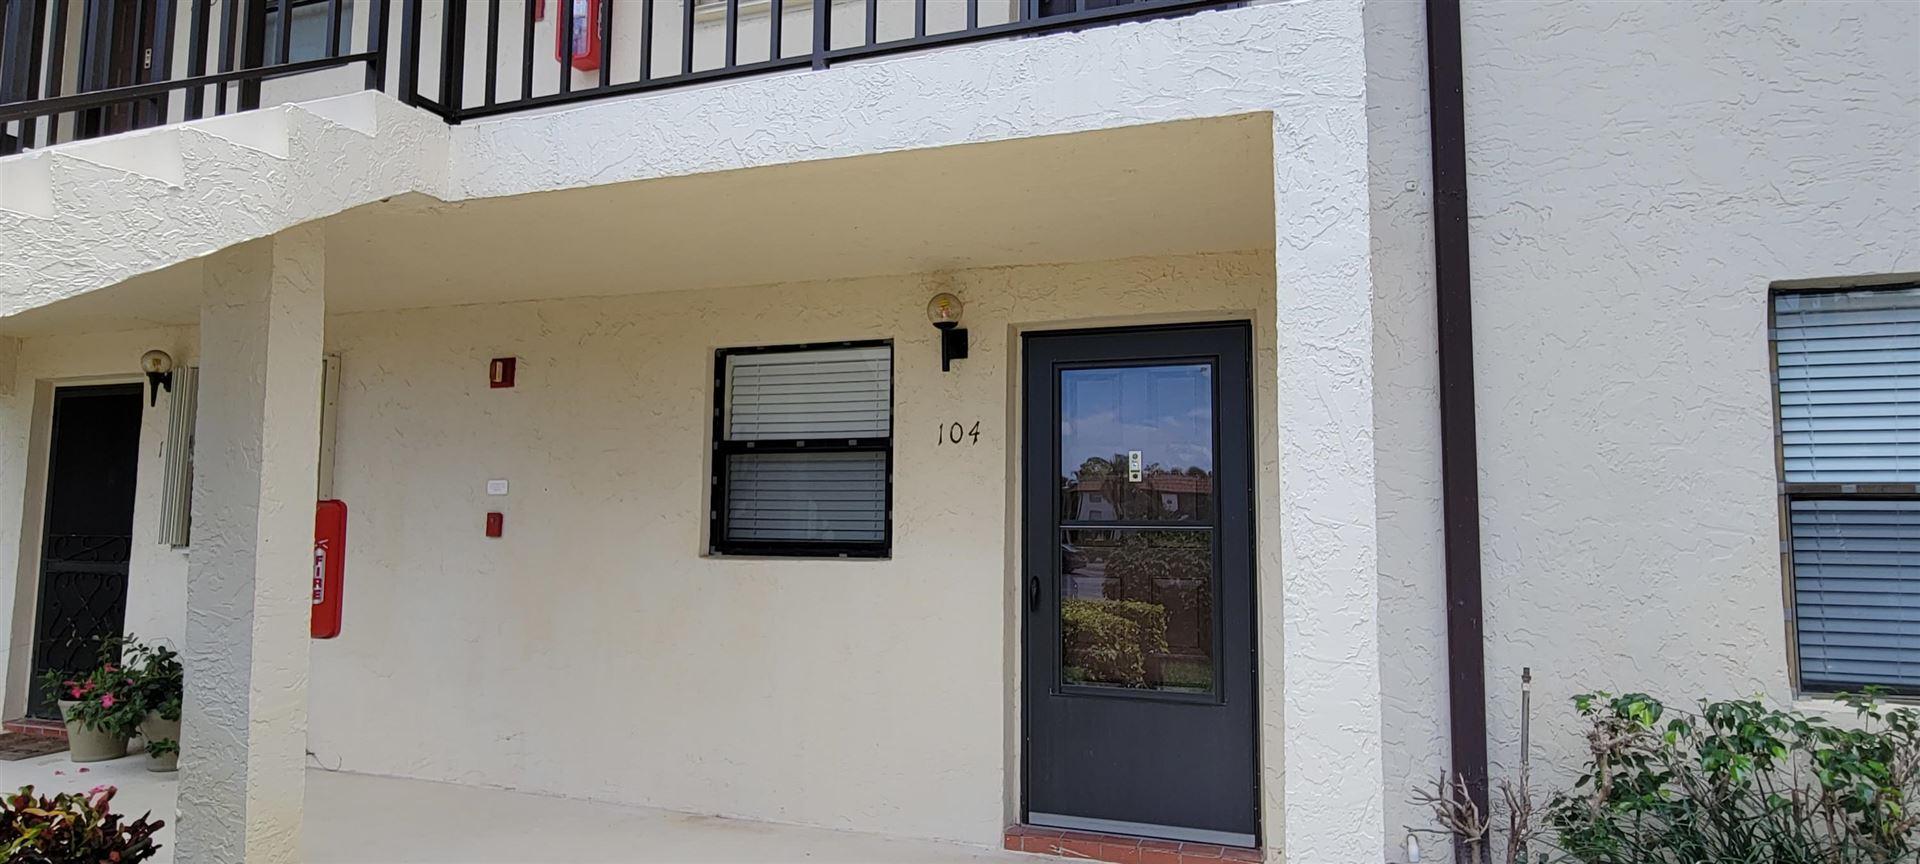 7118 Golf Colony Court #104, Lake Worth, FL 33467 - MLS#: RX-10715238